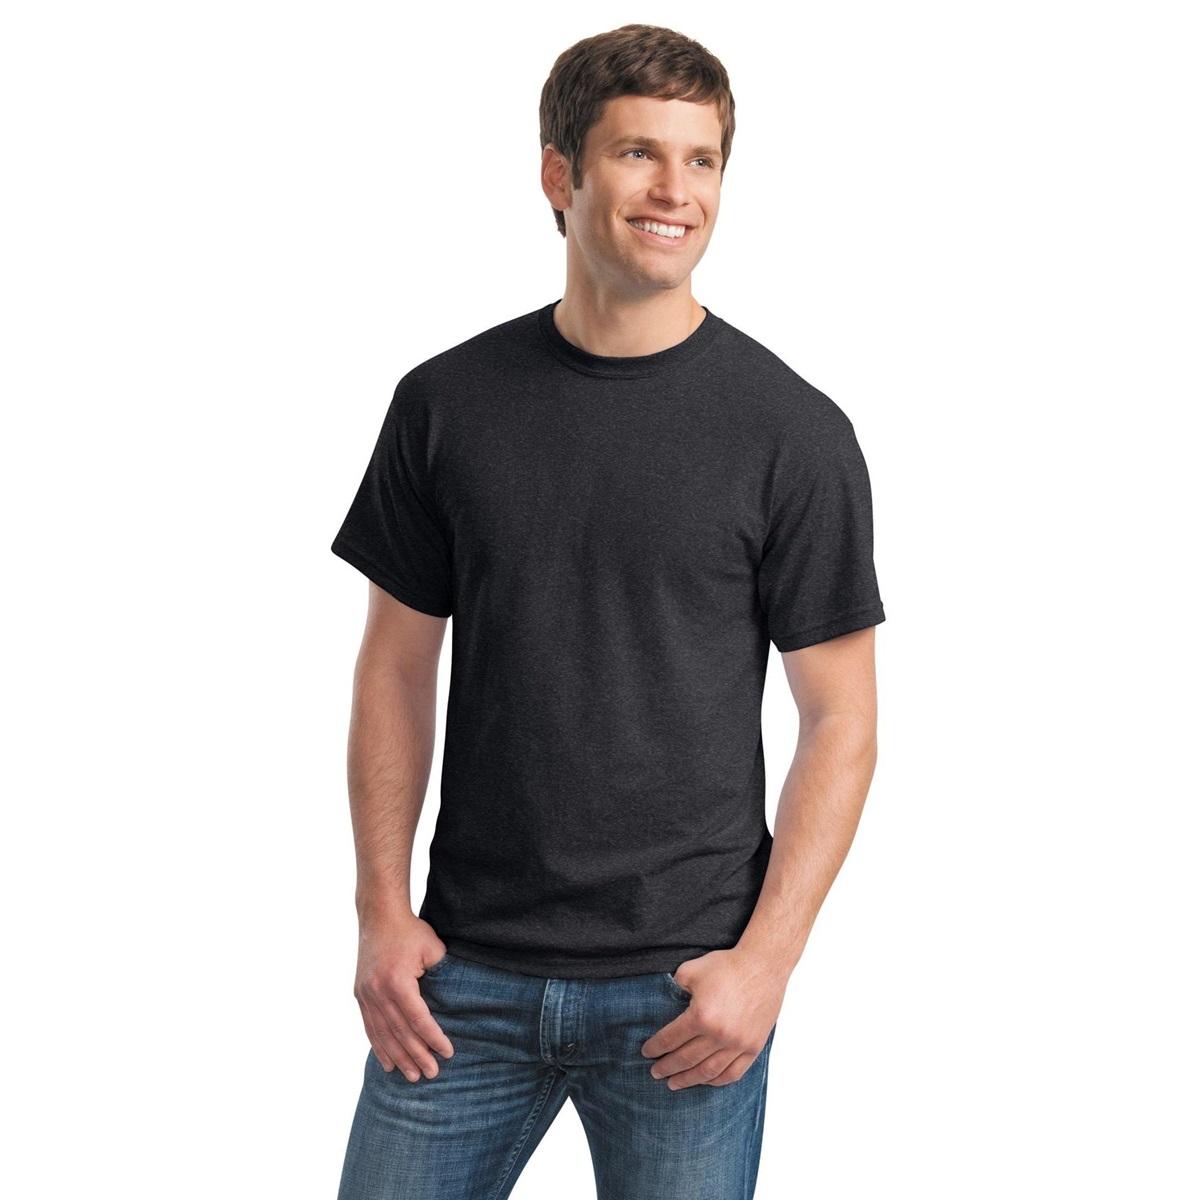 Gildan 8000 dryblend t shirt dark heather for Gildan 8000 t shirt